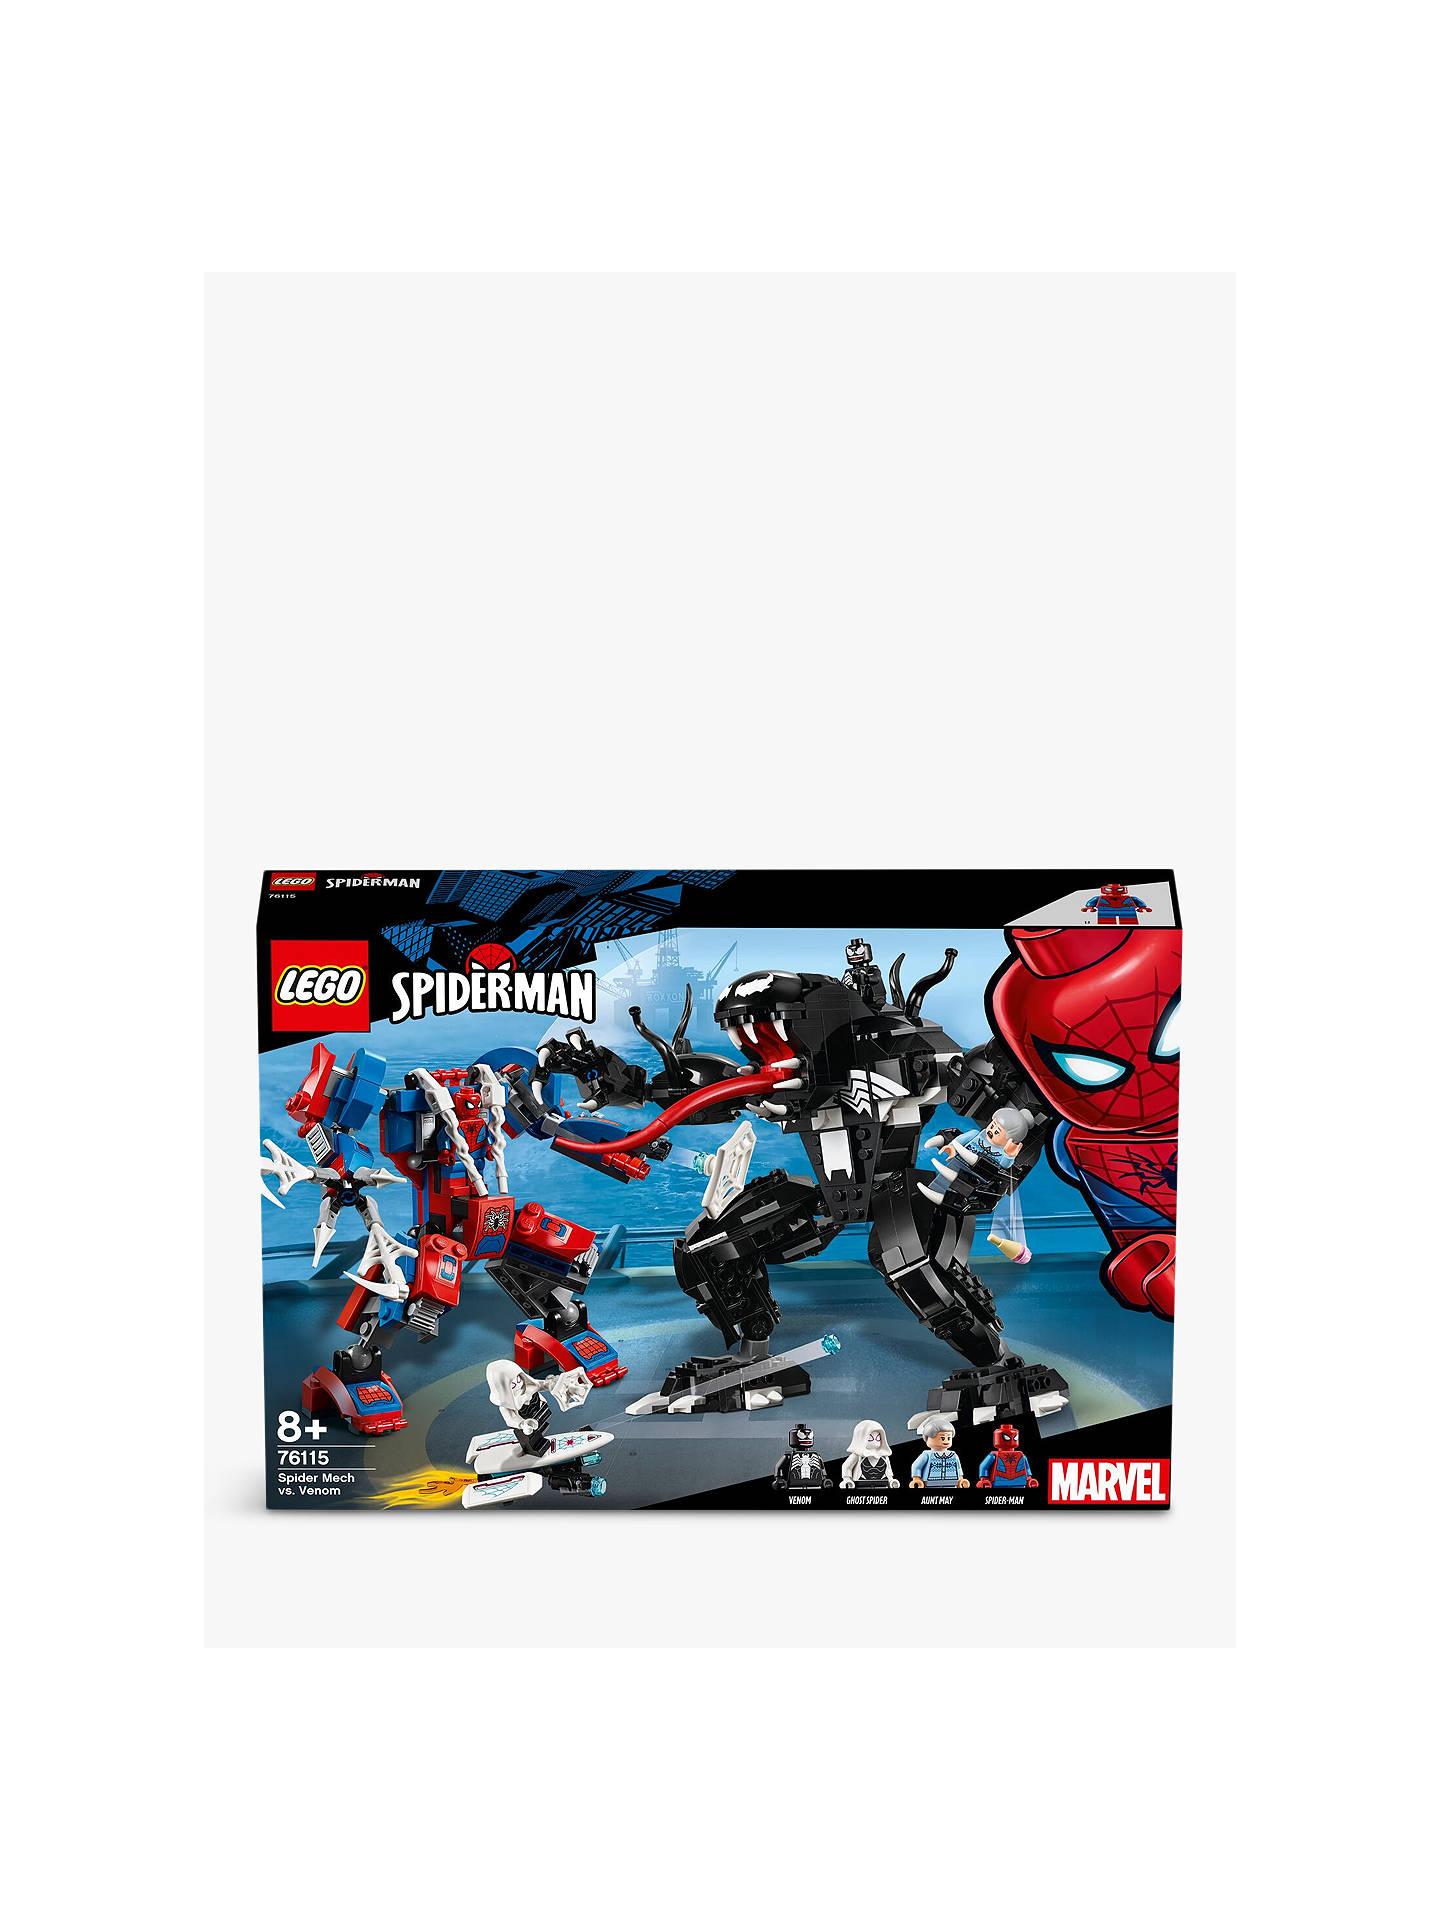 Lego Marvel Super Heroes 76115 Spider Mech Vs Venom At John Lewis